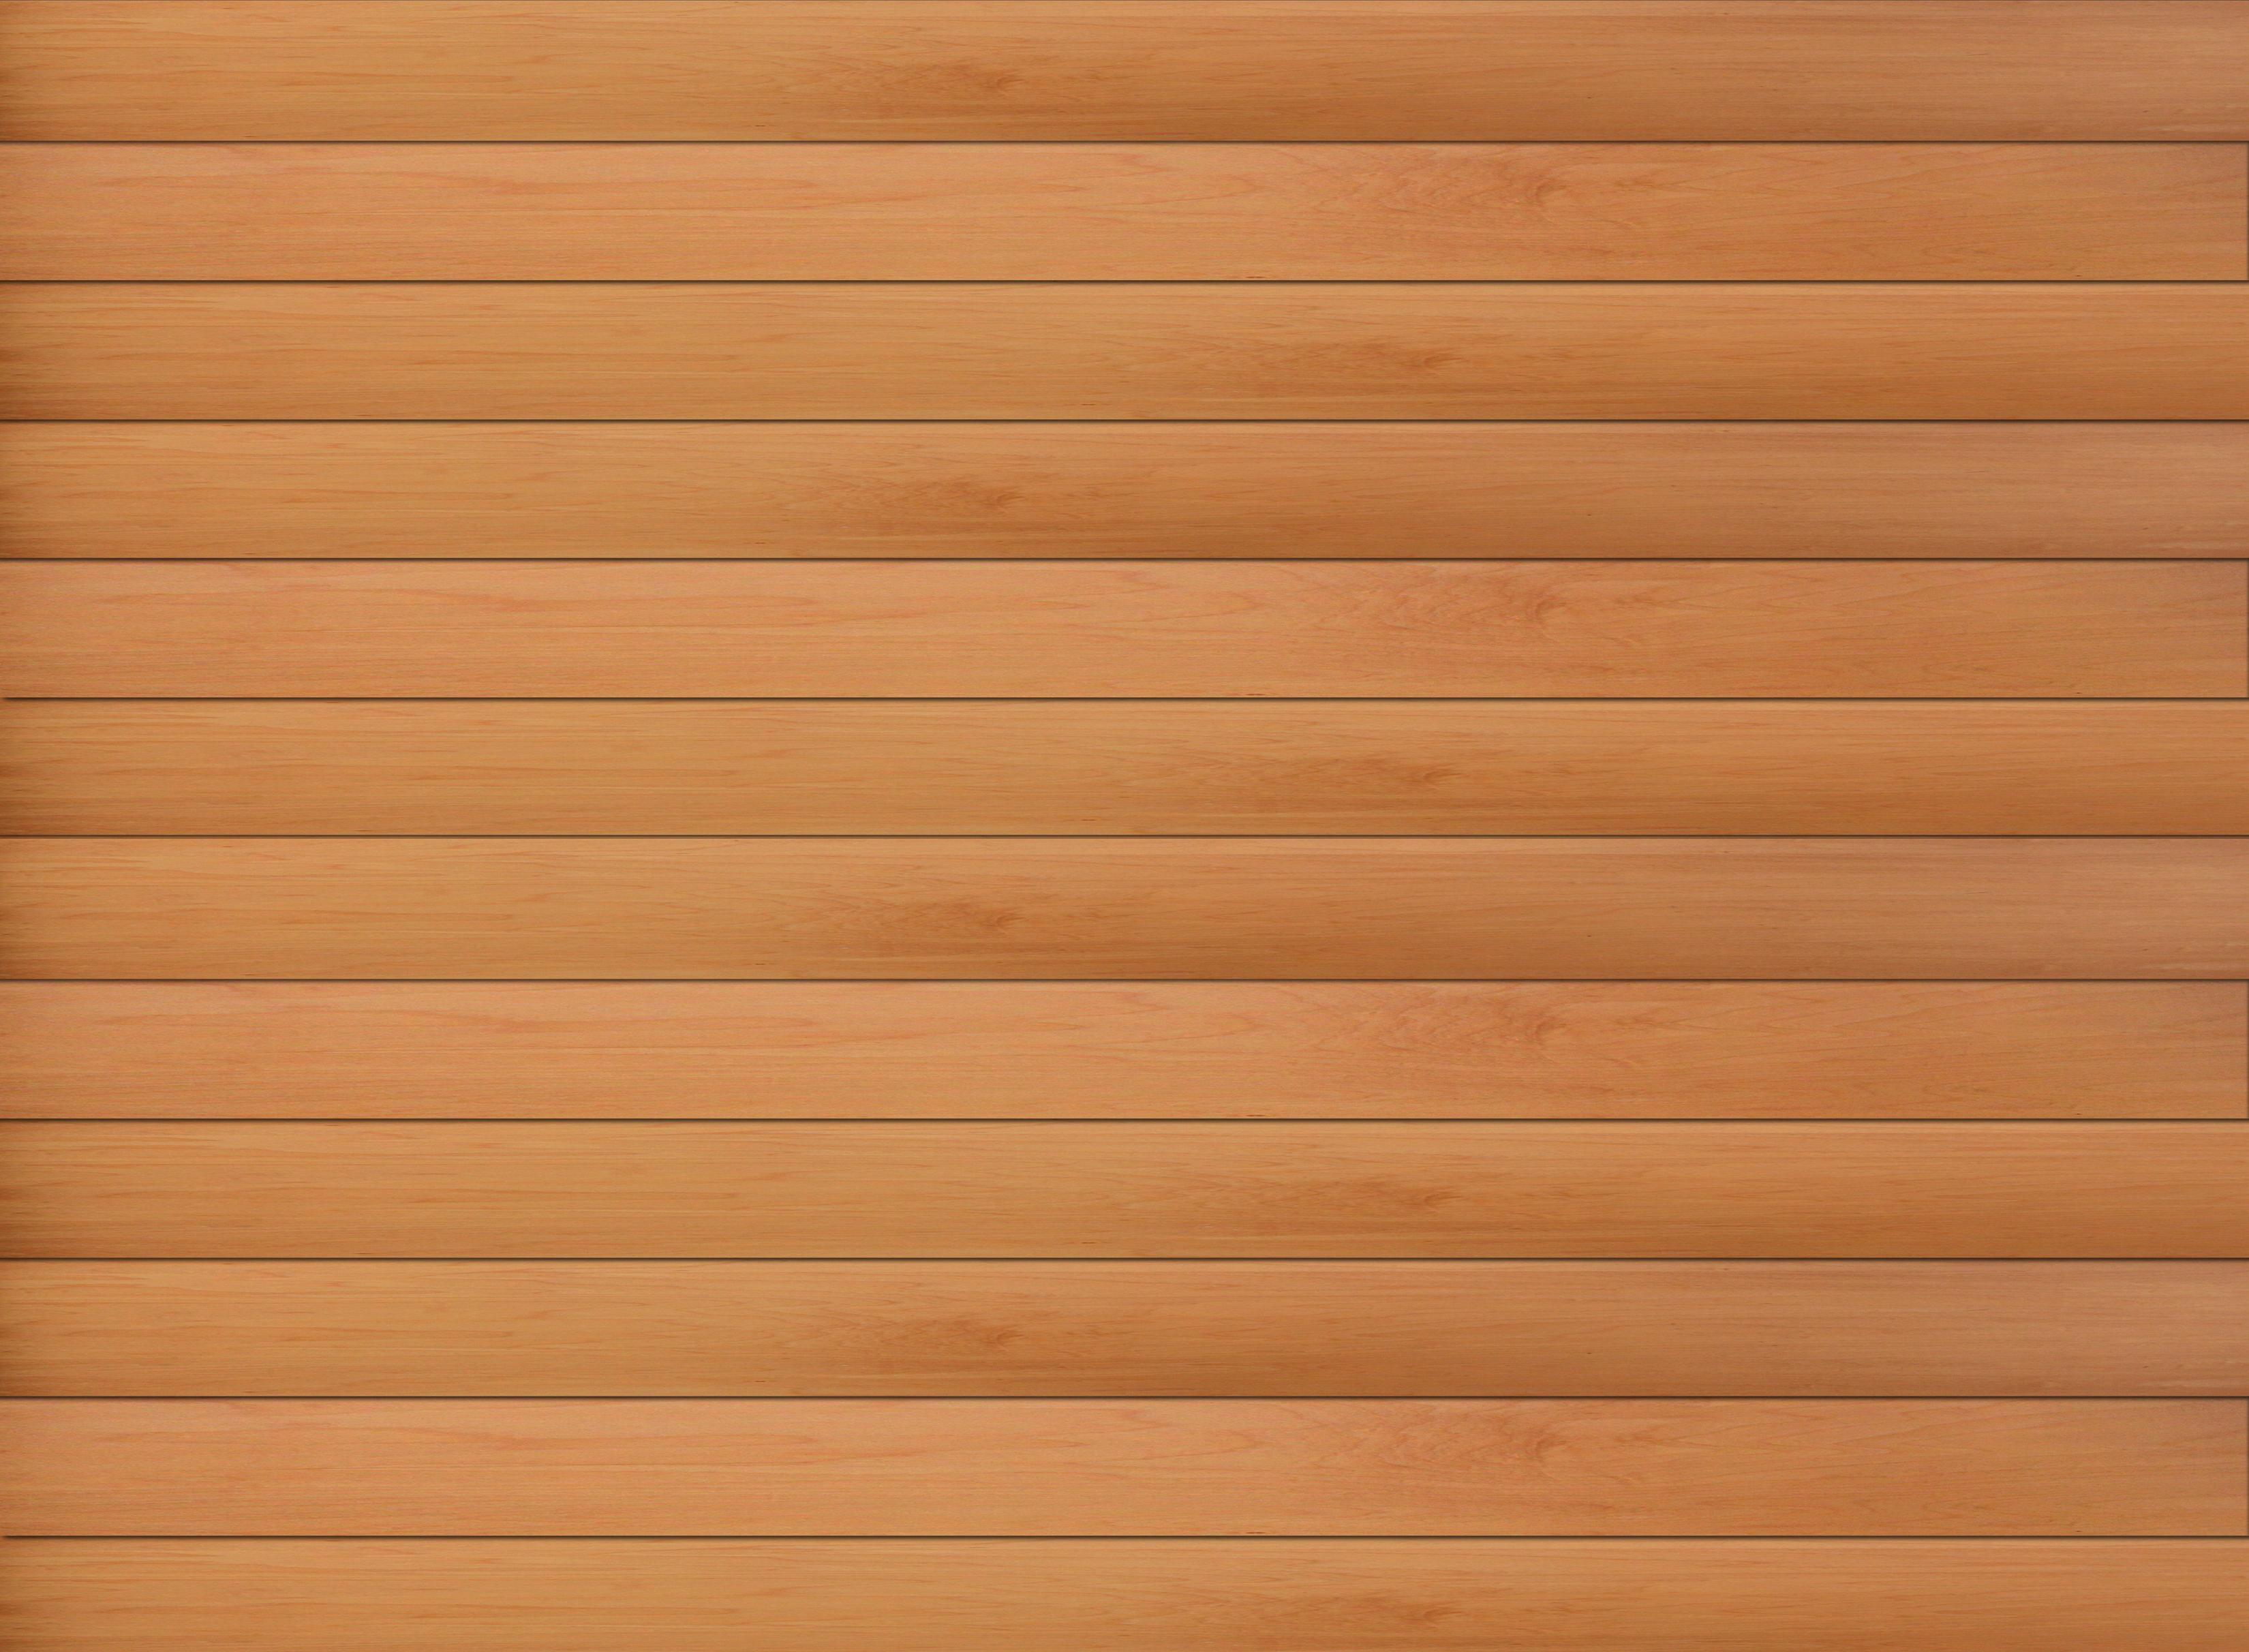 Wood Siding Is Wood Siding Good